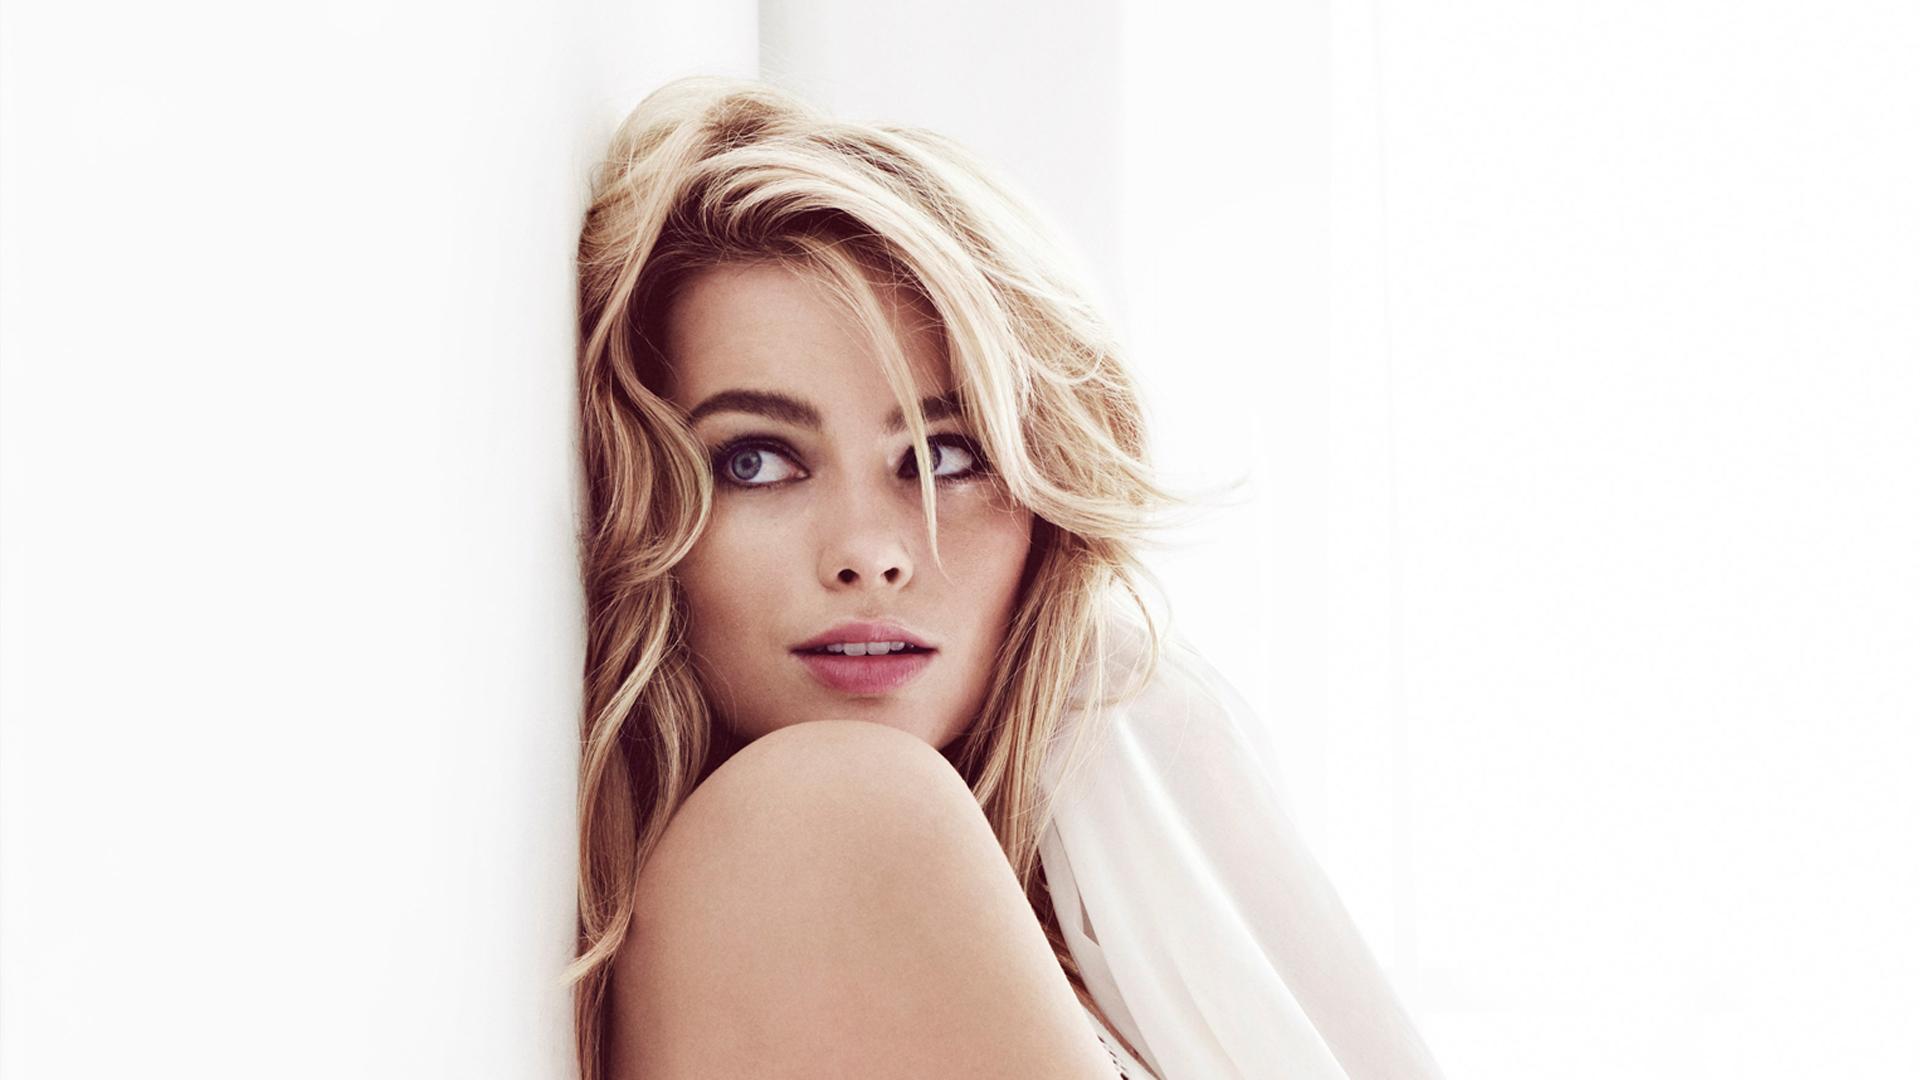 「Margot Robbie」の画像検索結果